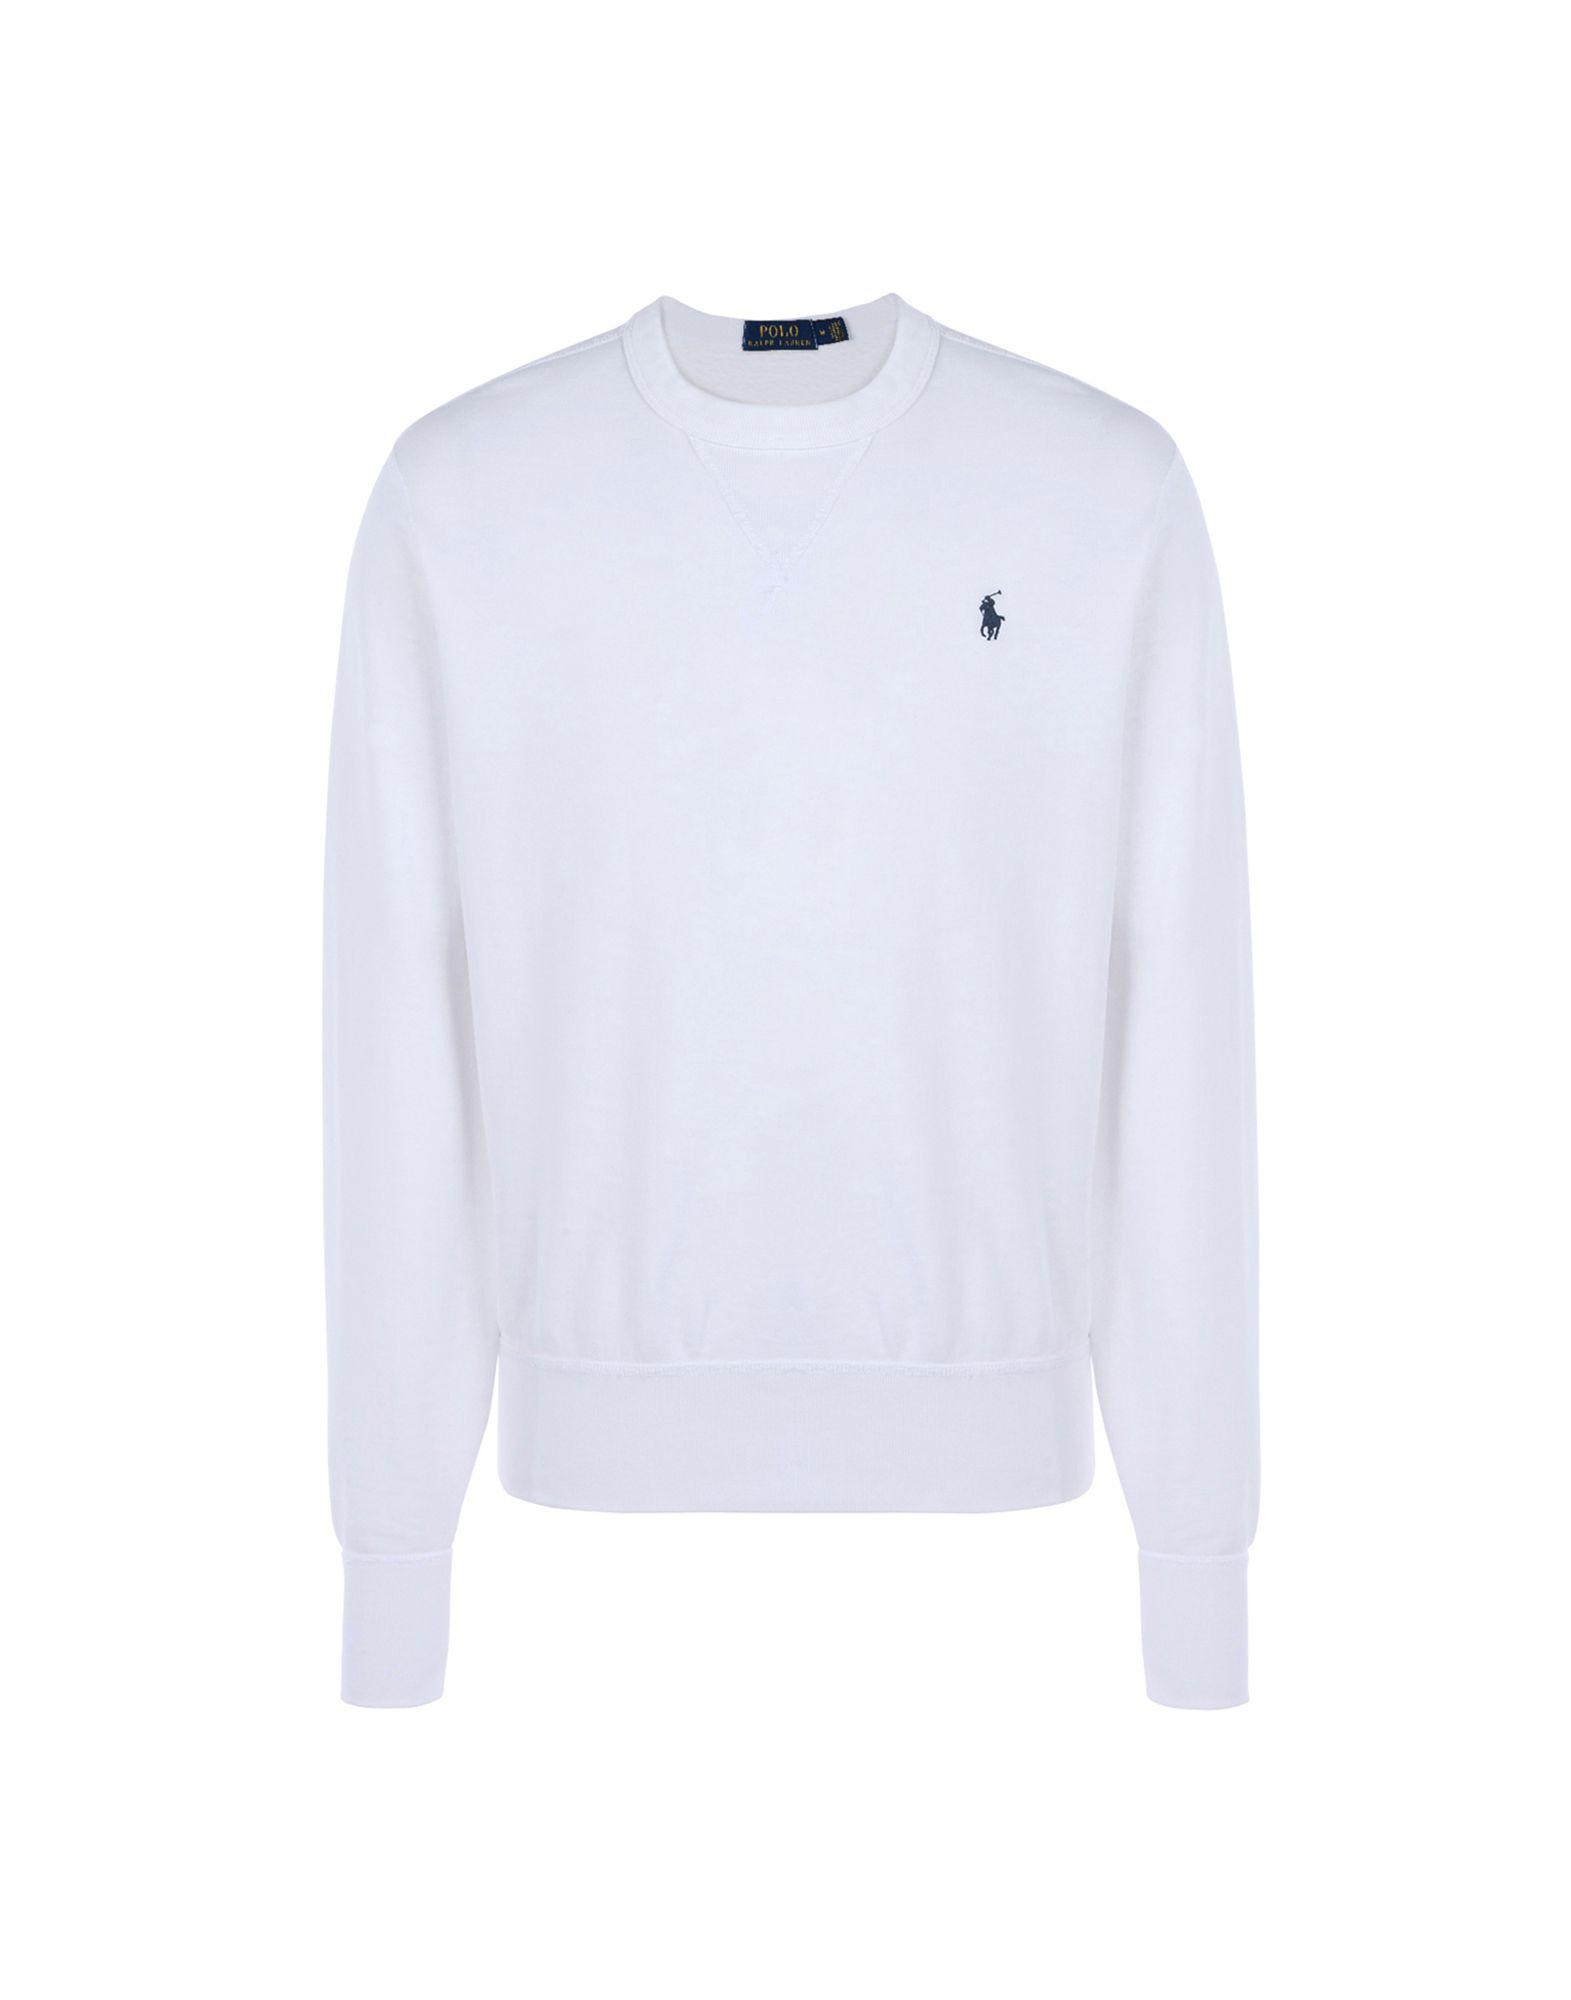 Homme Coloris Blanc Shirt De Sweat BWdoerCQxE